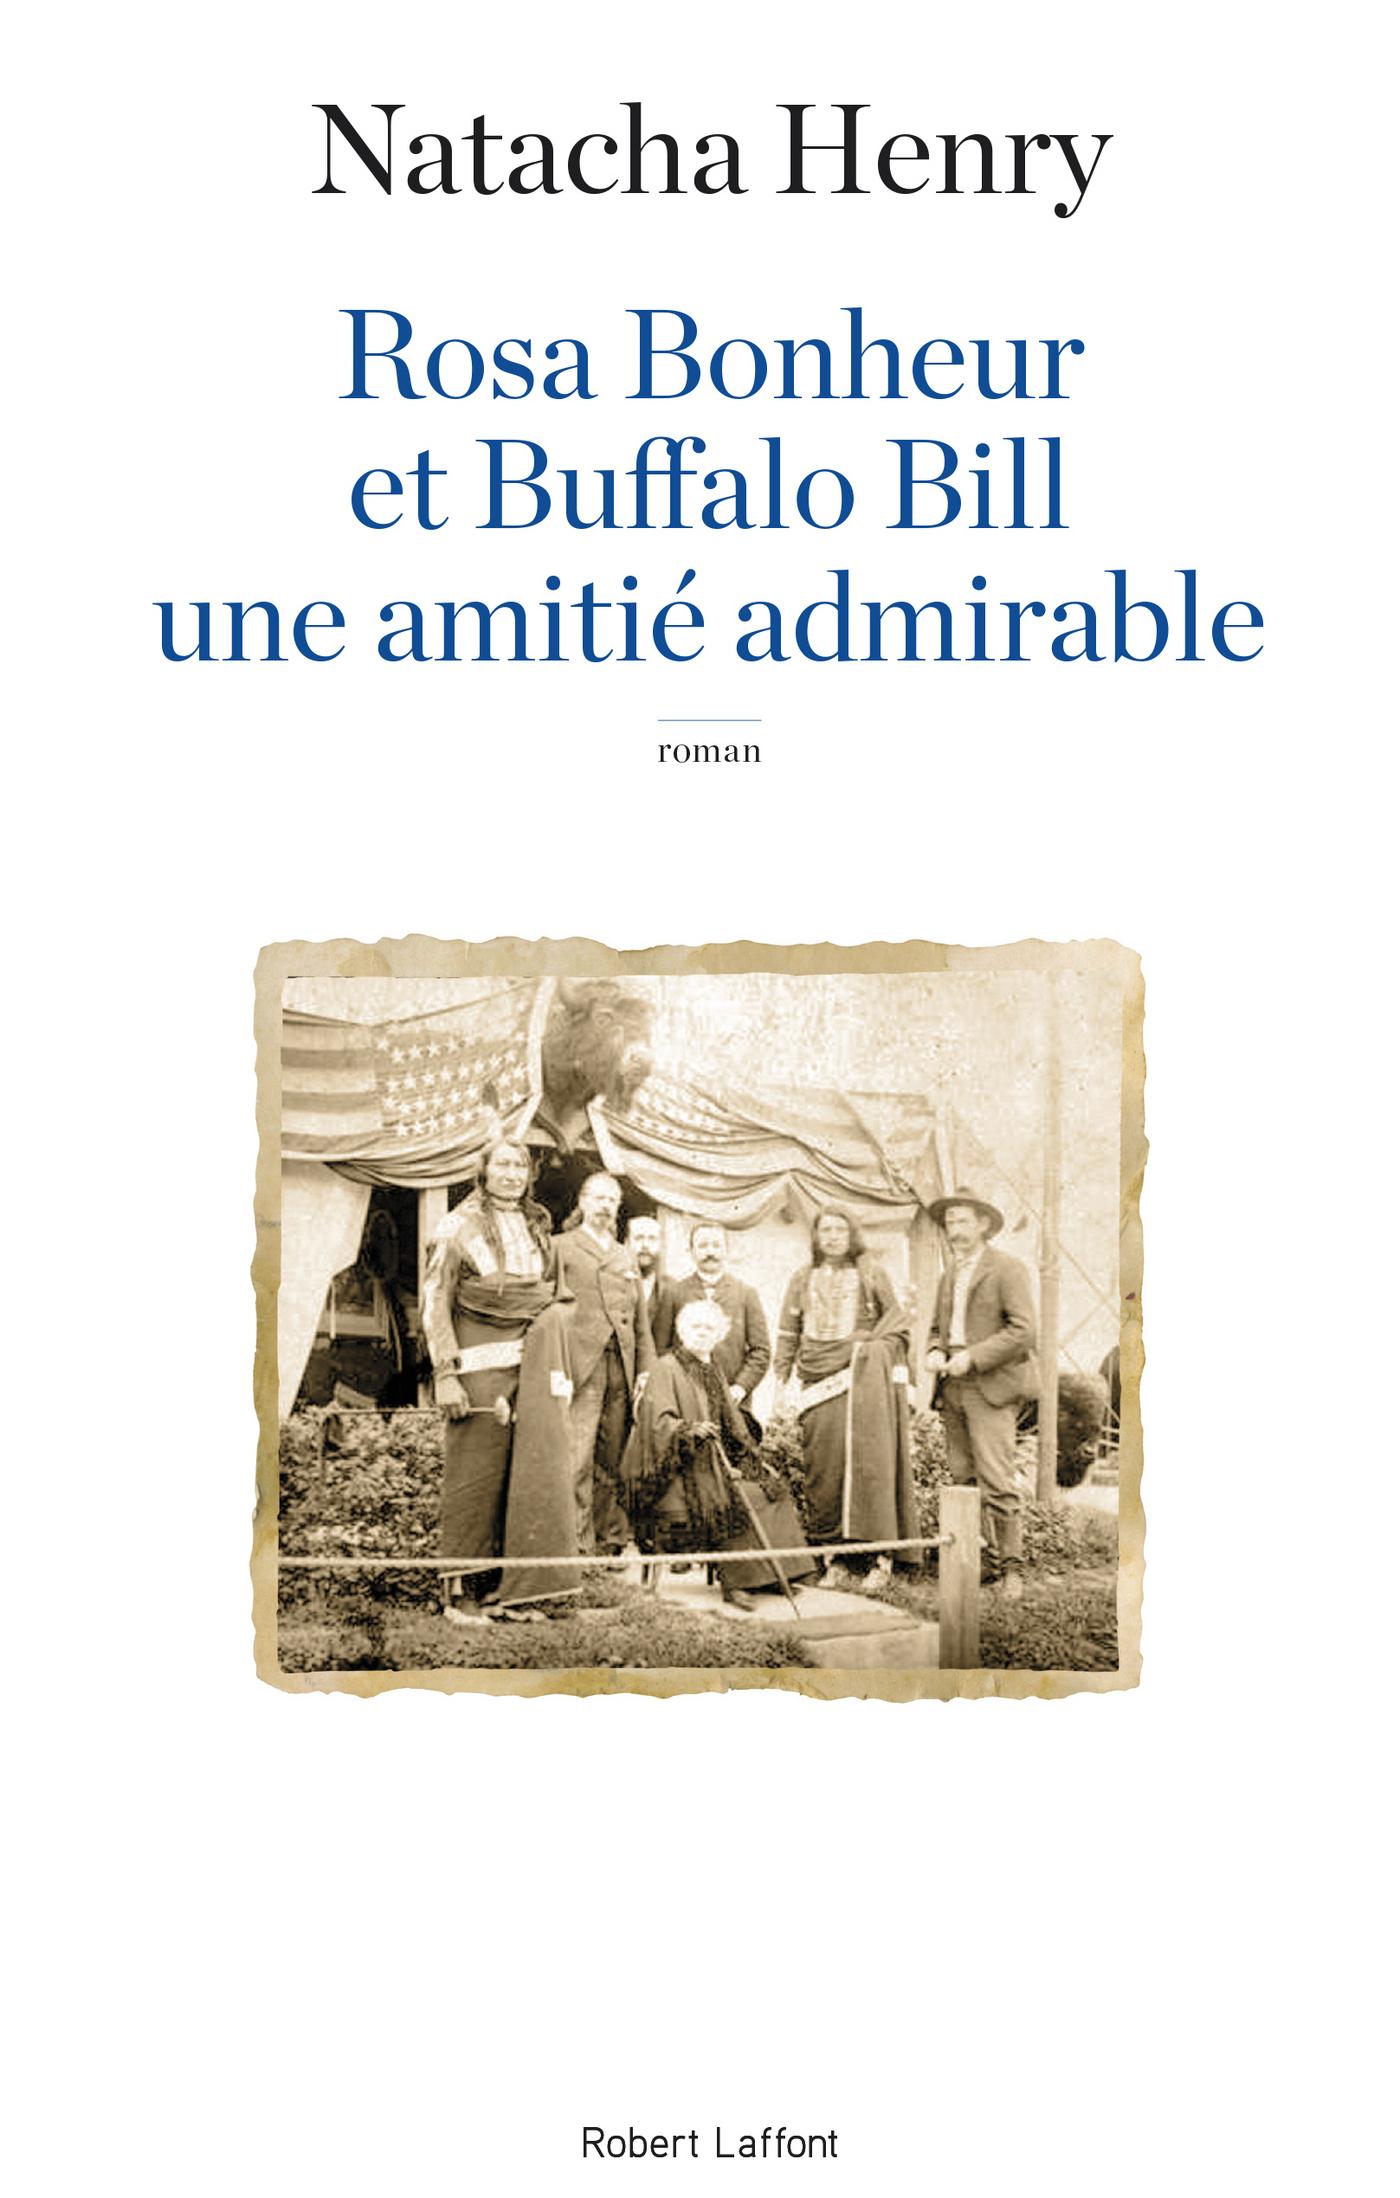 Rosa Bonheur et Buffalo Bill, une amitié admirable | HENRY, Natacha